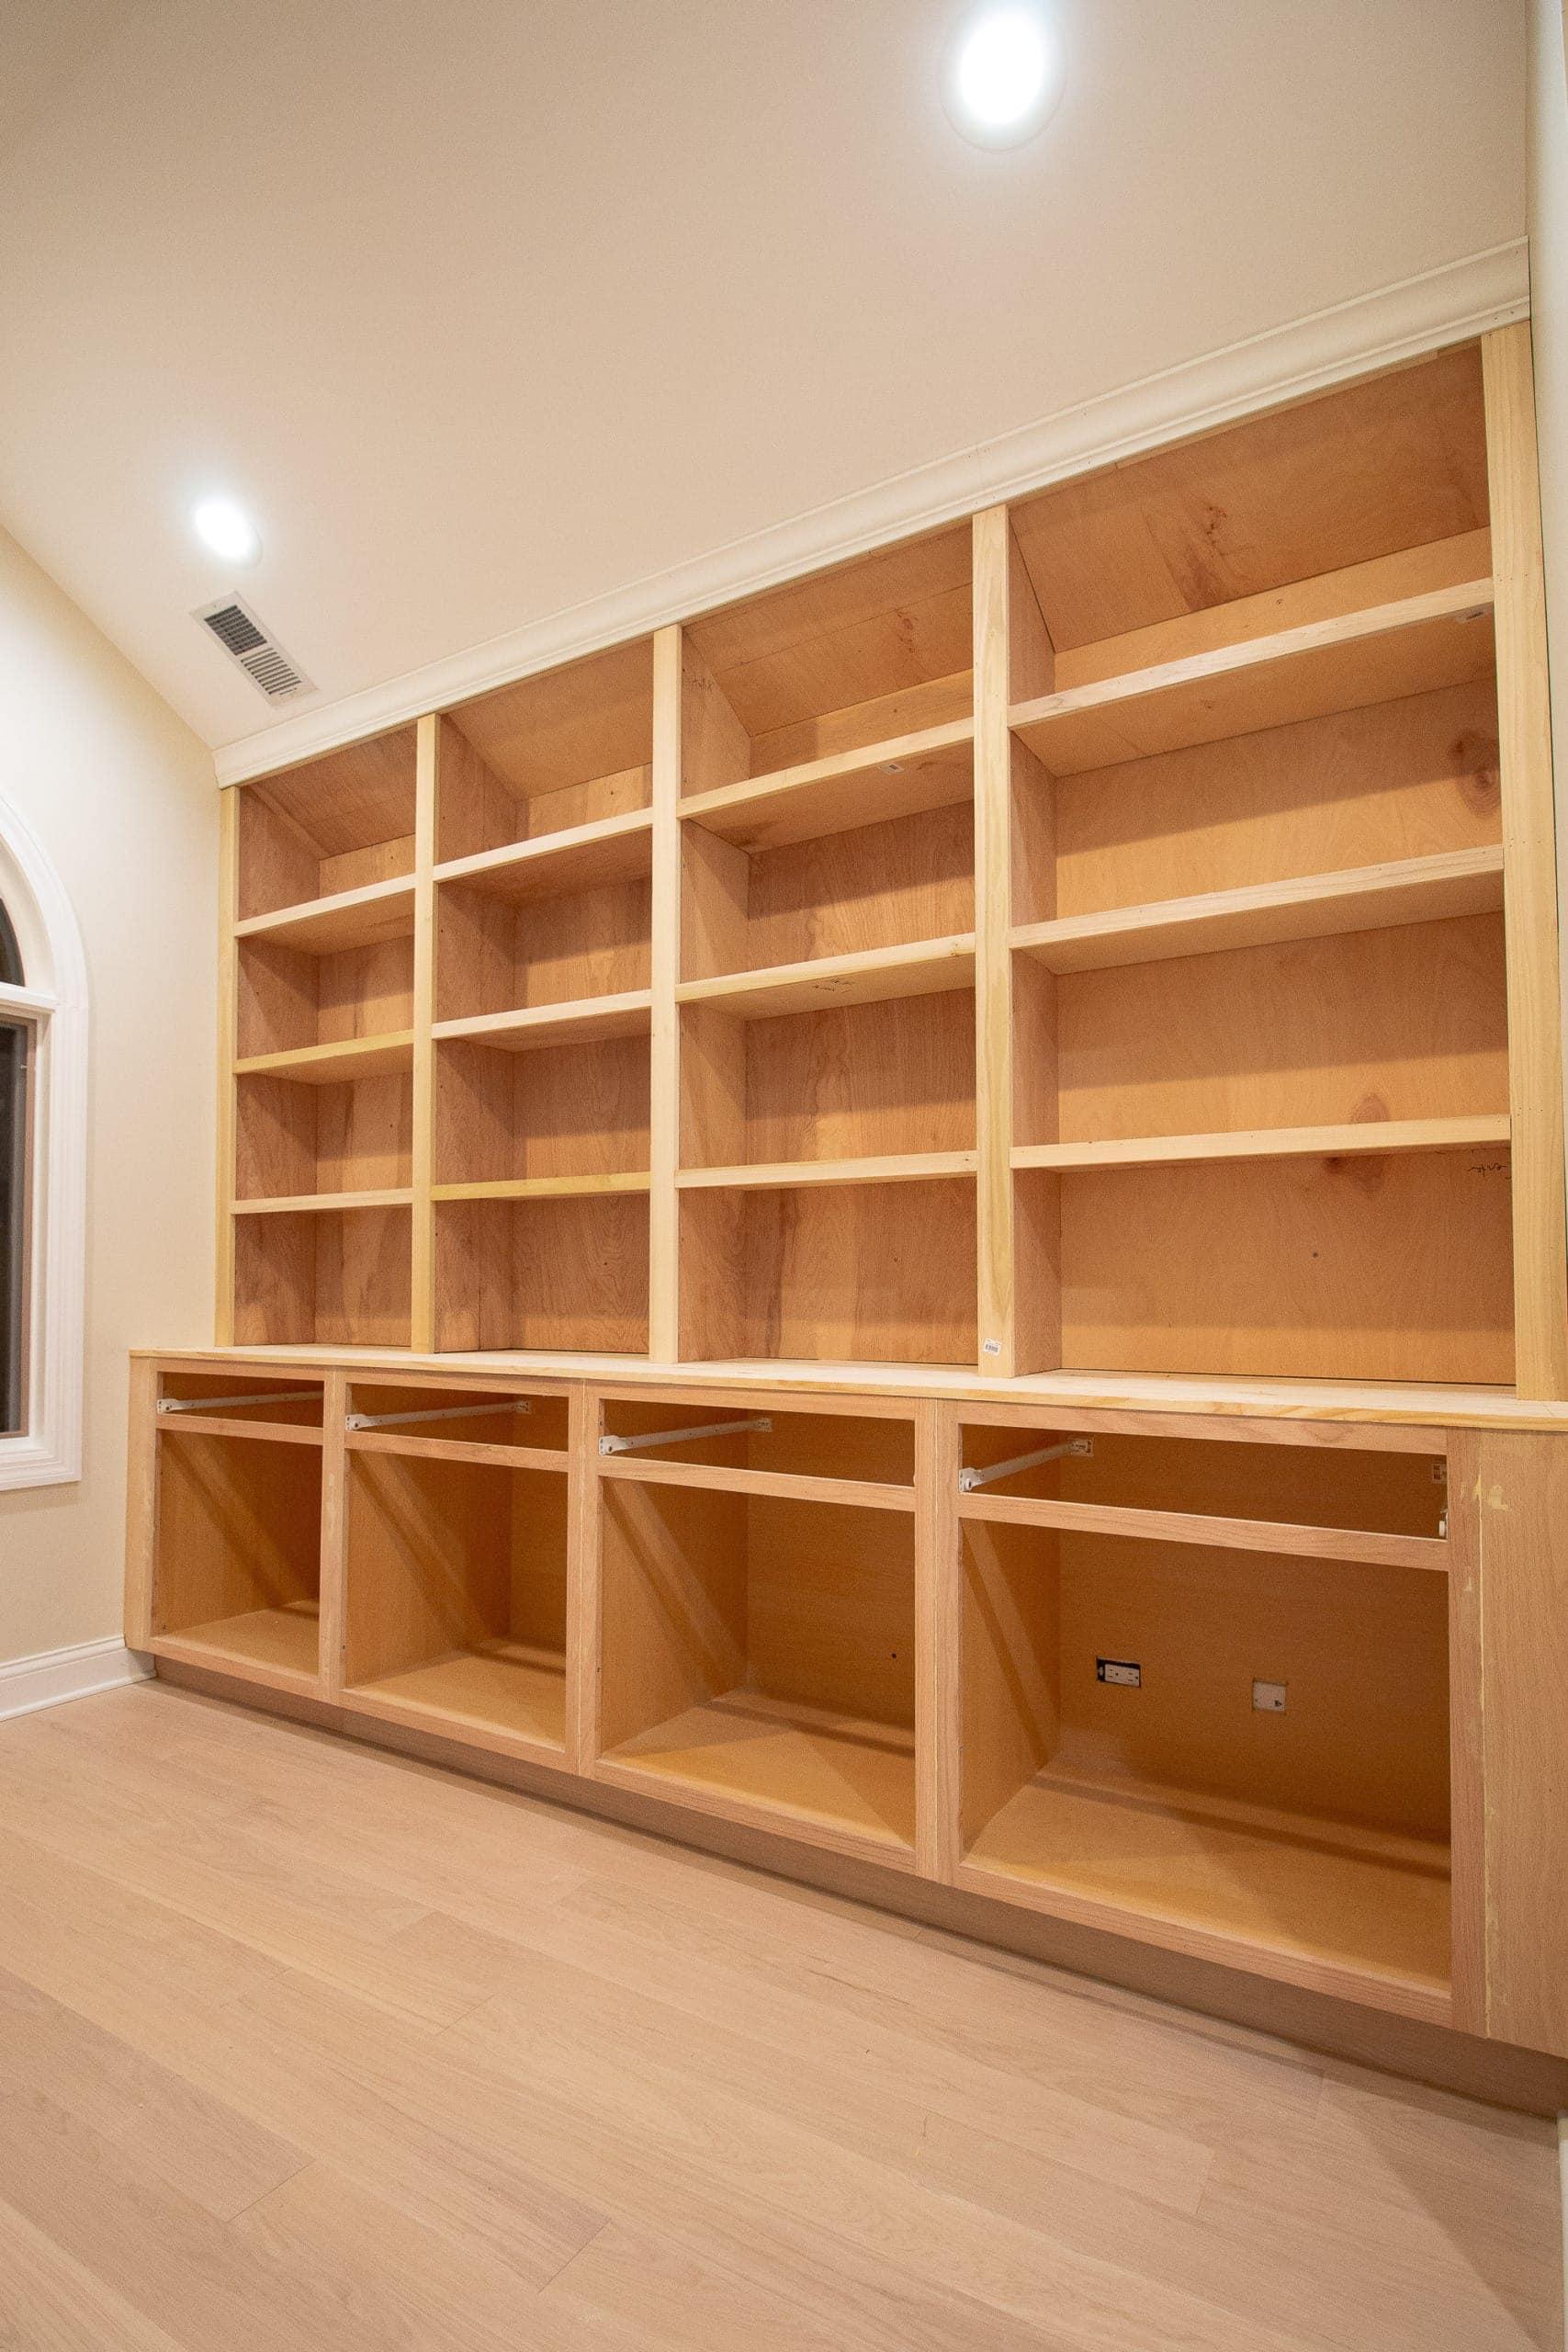 How to DIY bookshelves for built-ins